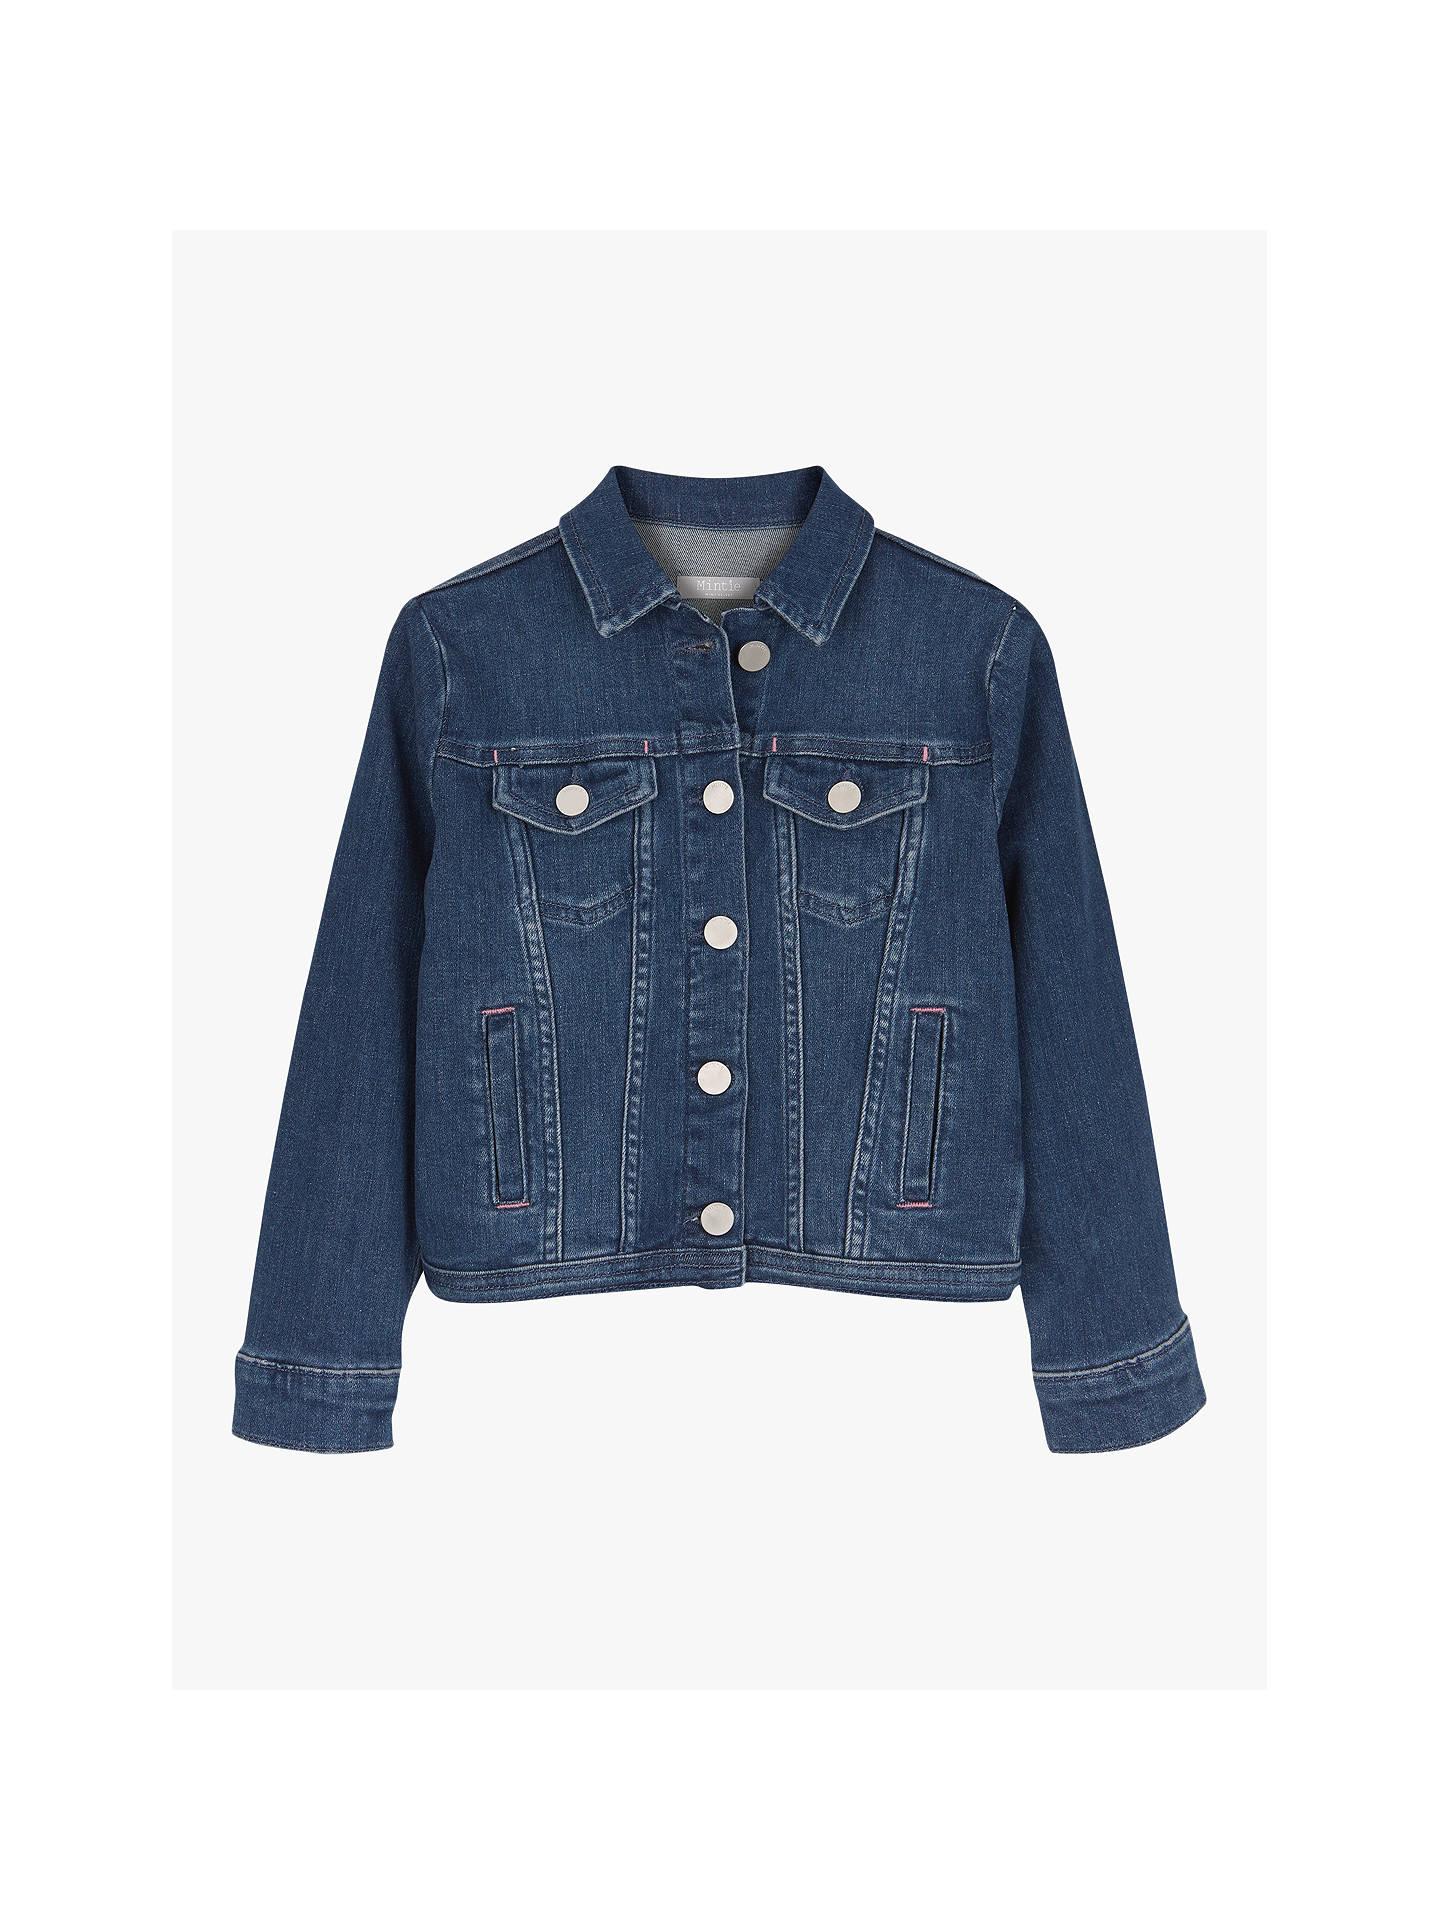 34cfc50b Mintie by Mint Velvet Girls' Authentic Denim Jacket, Blue